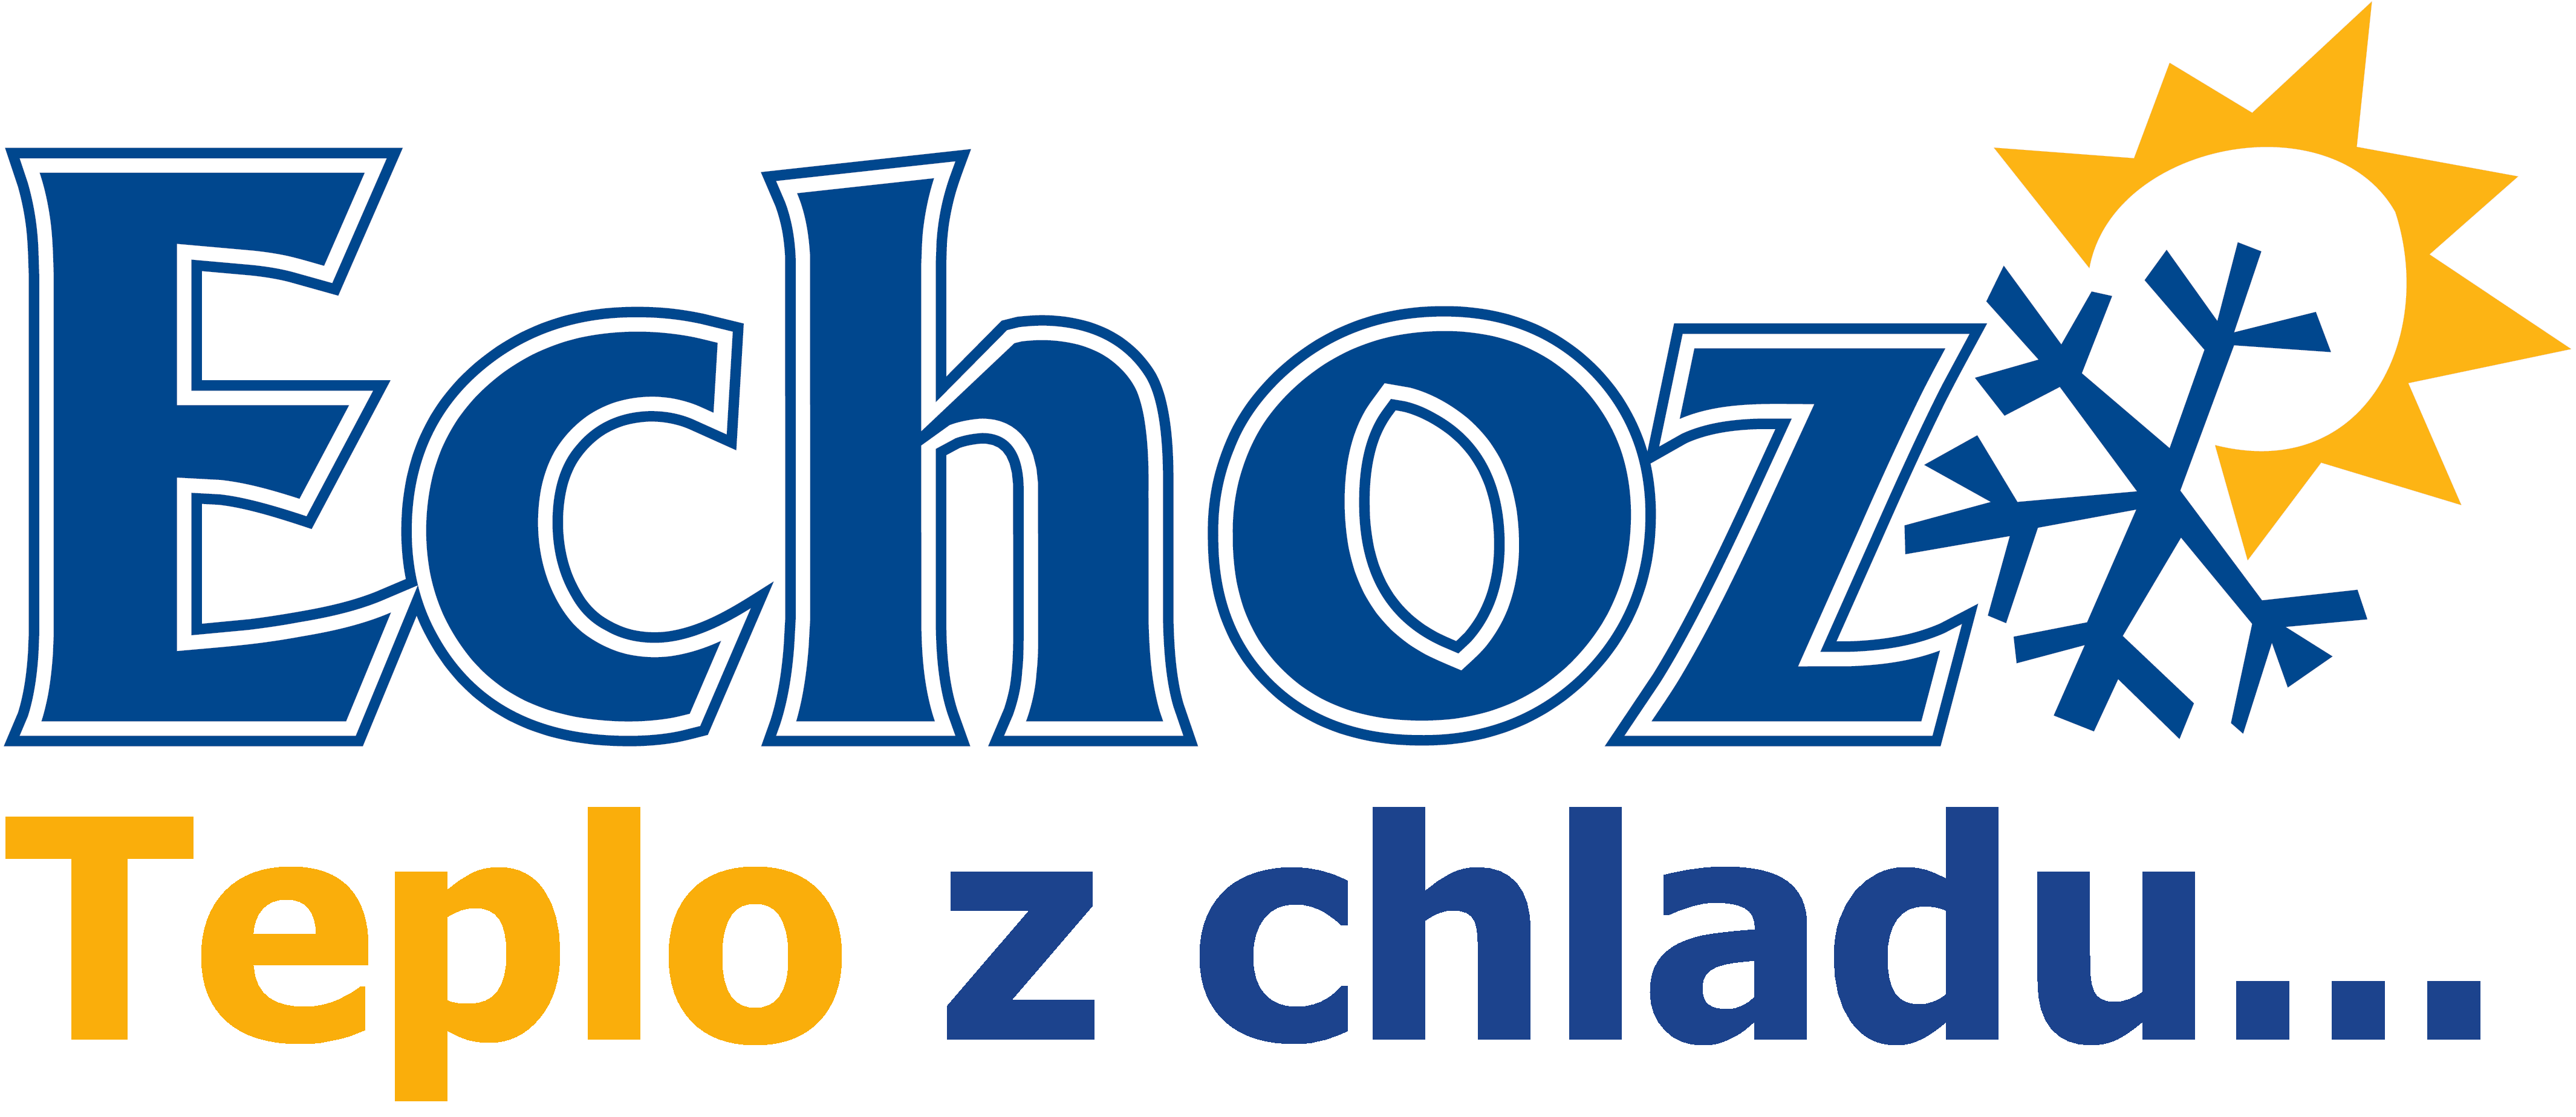 Echoz